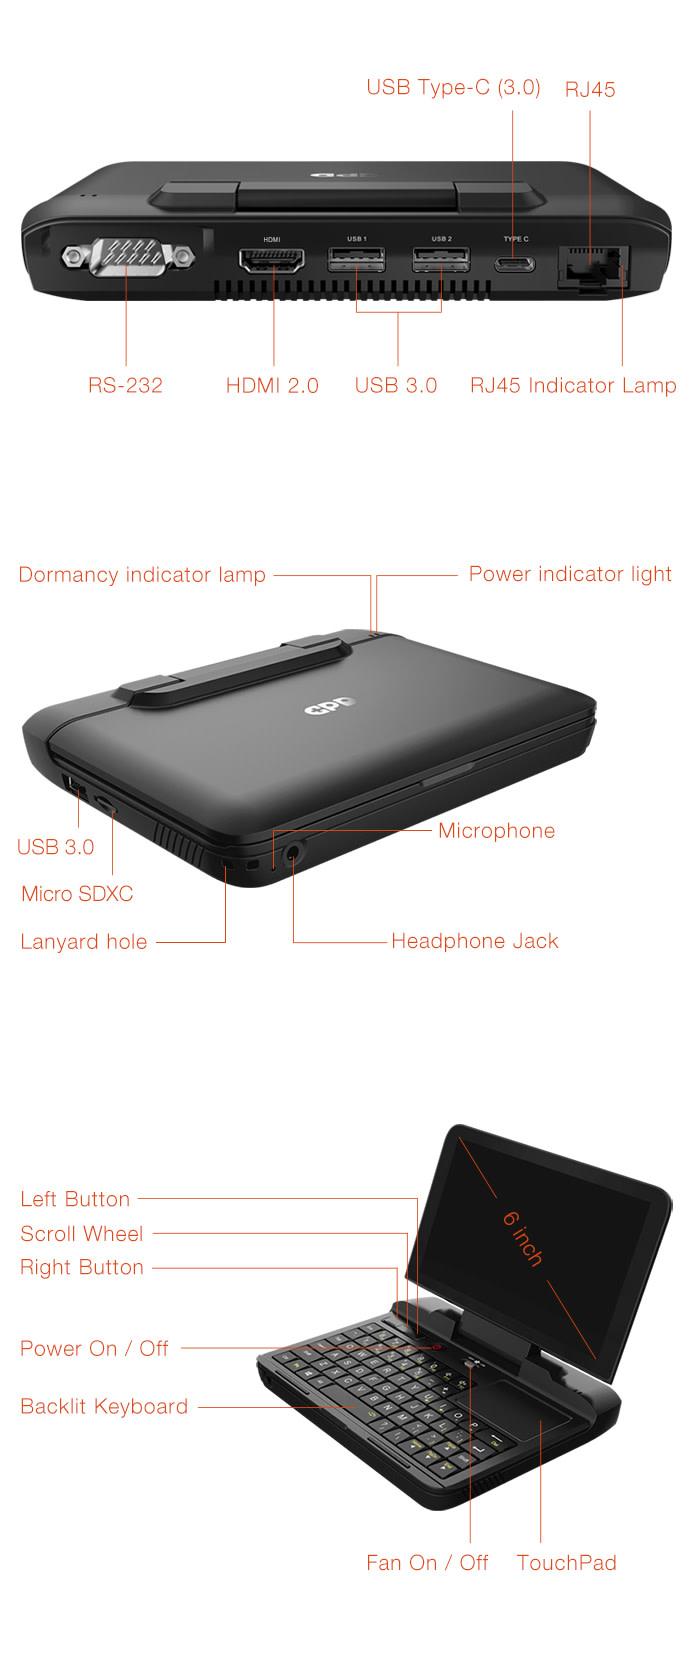 Windows 10 Pro or Ubuntu MATE. Supports RS-232, RJ45, Type C, USB 3.0, HDMI, microSDXC.